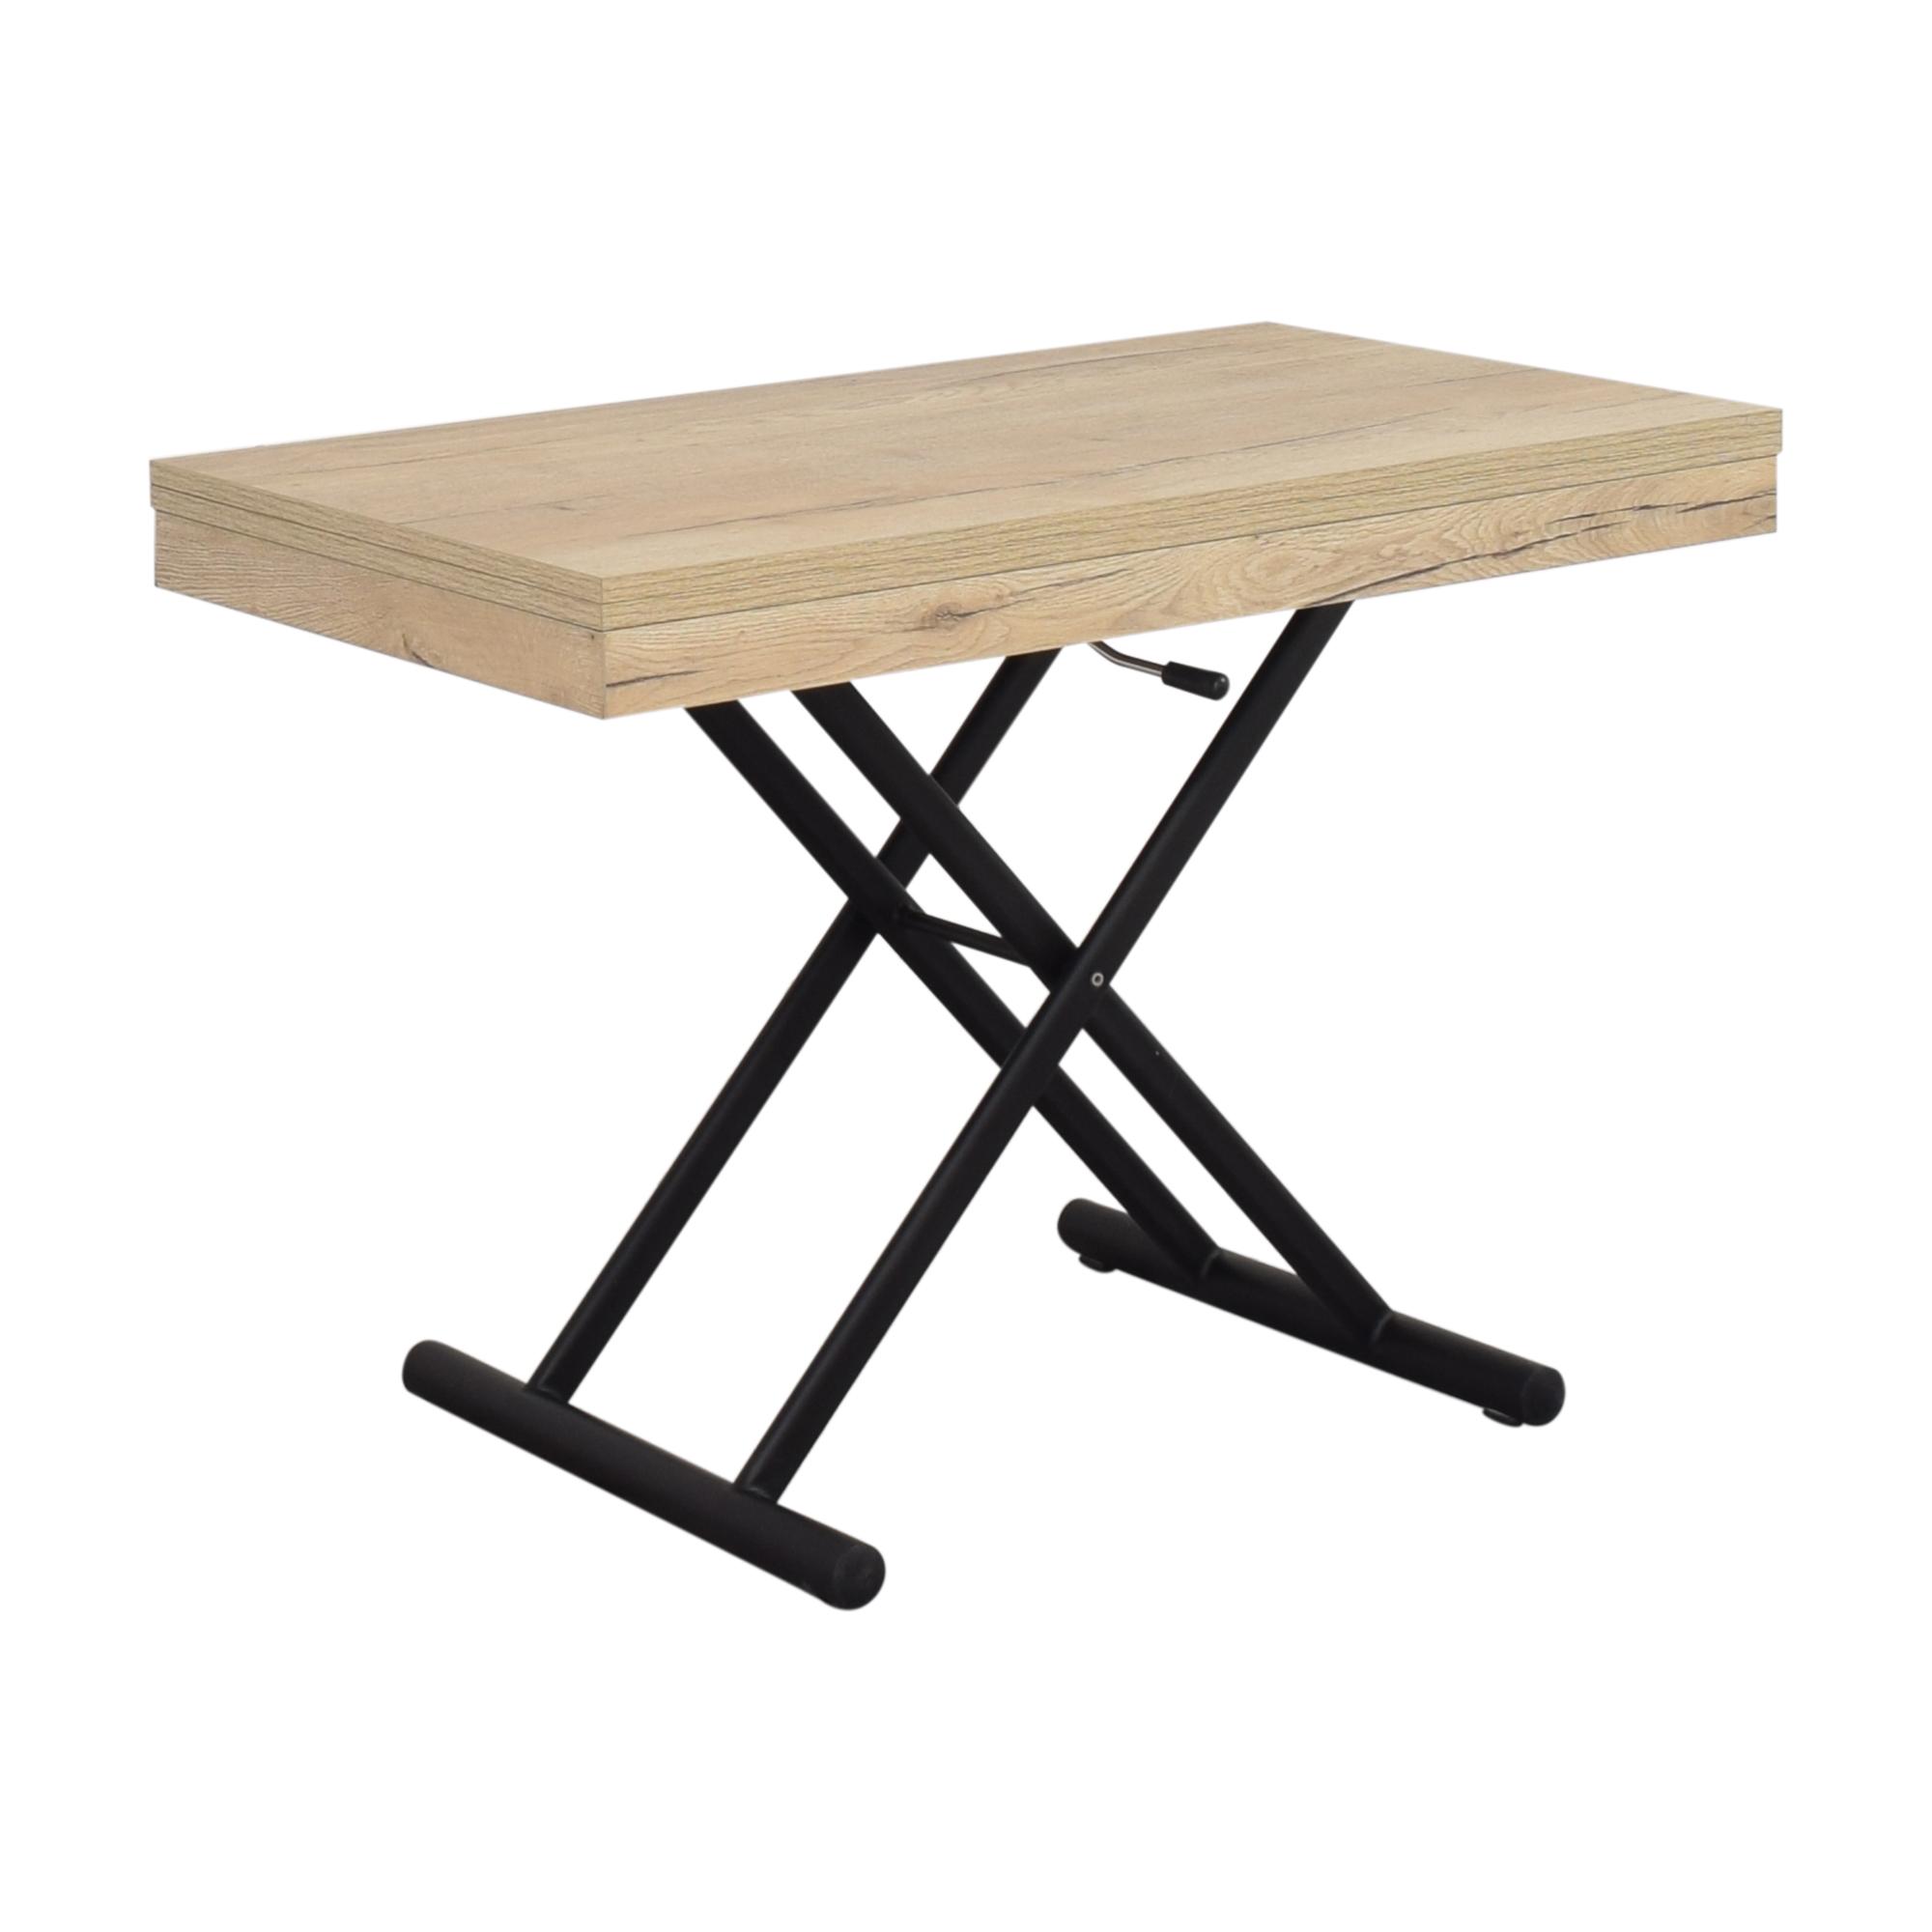 Expand Furniture Expand Furniture Alzare Square Transforming Table nj